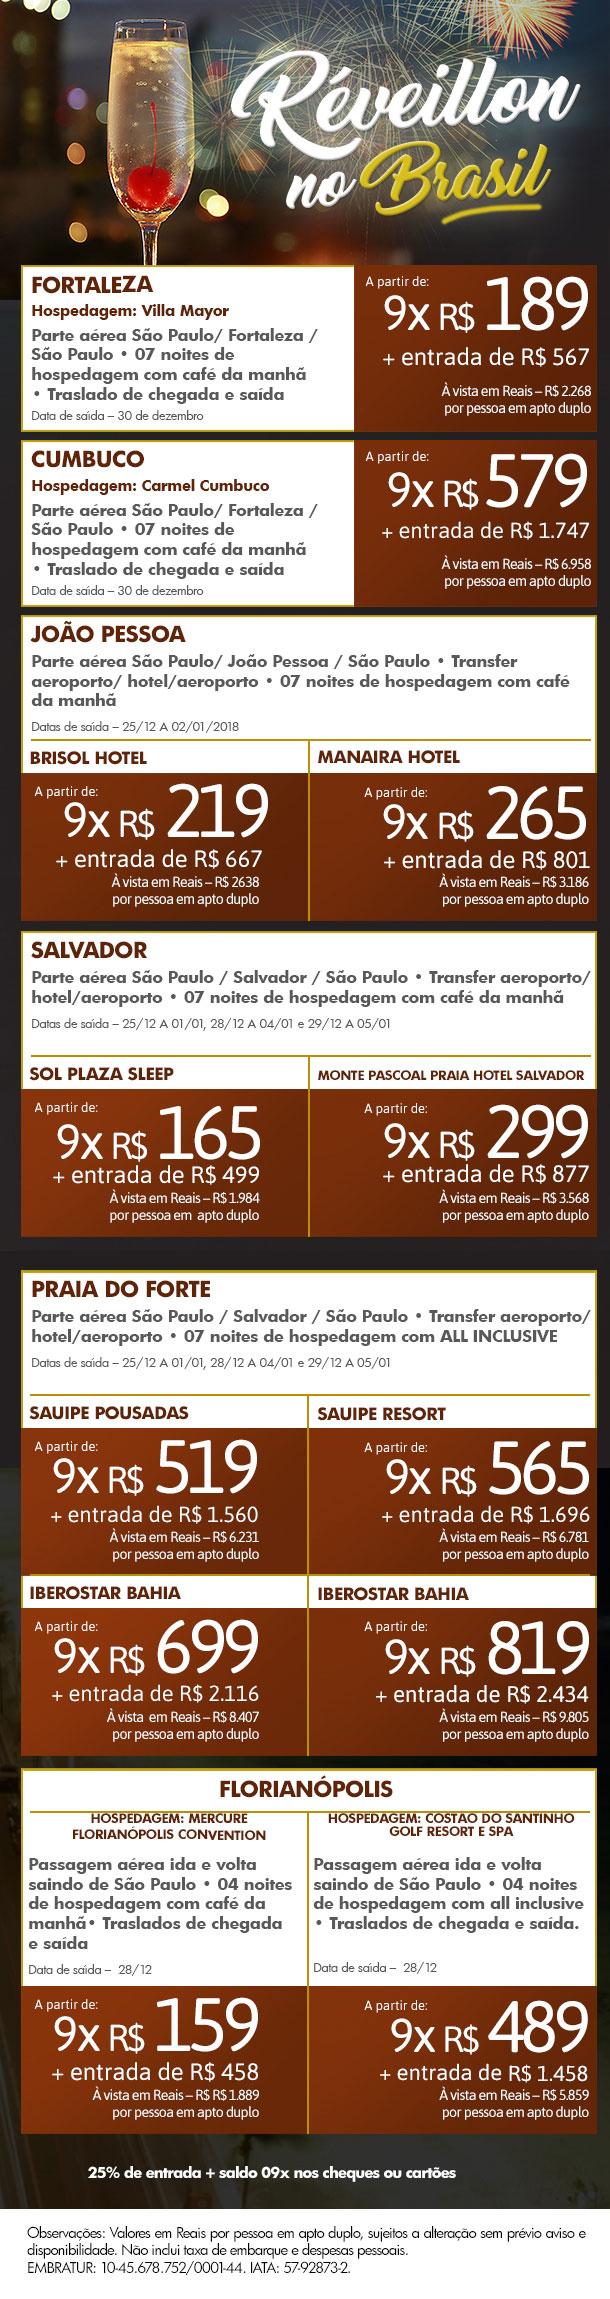 reveillon-no-brasil-saida-s